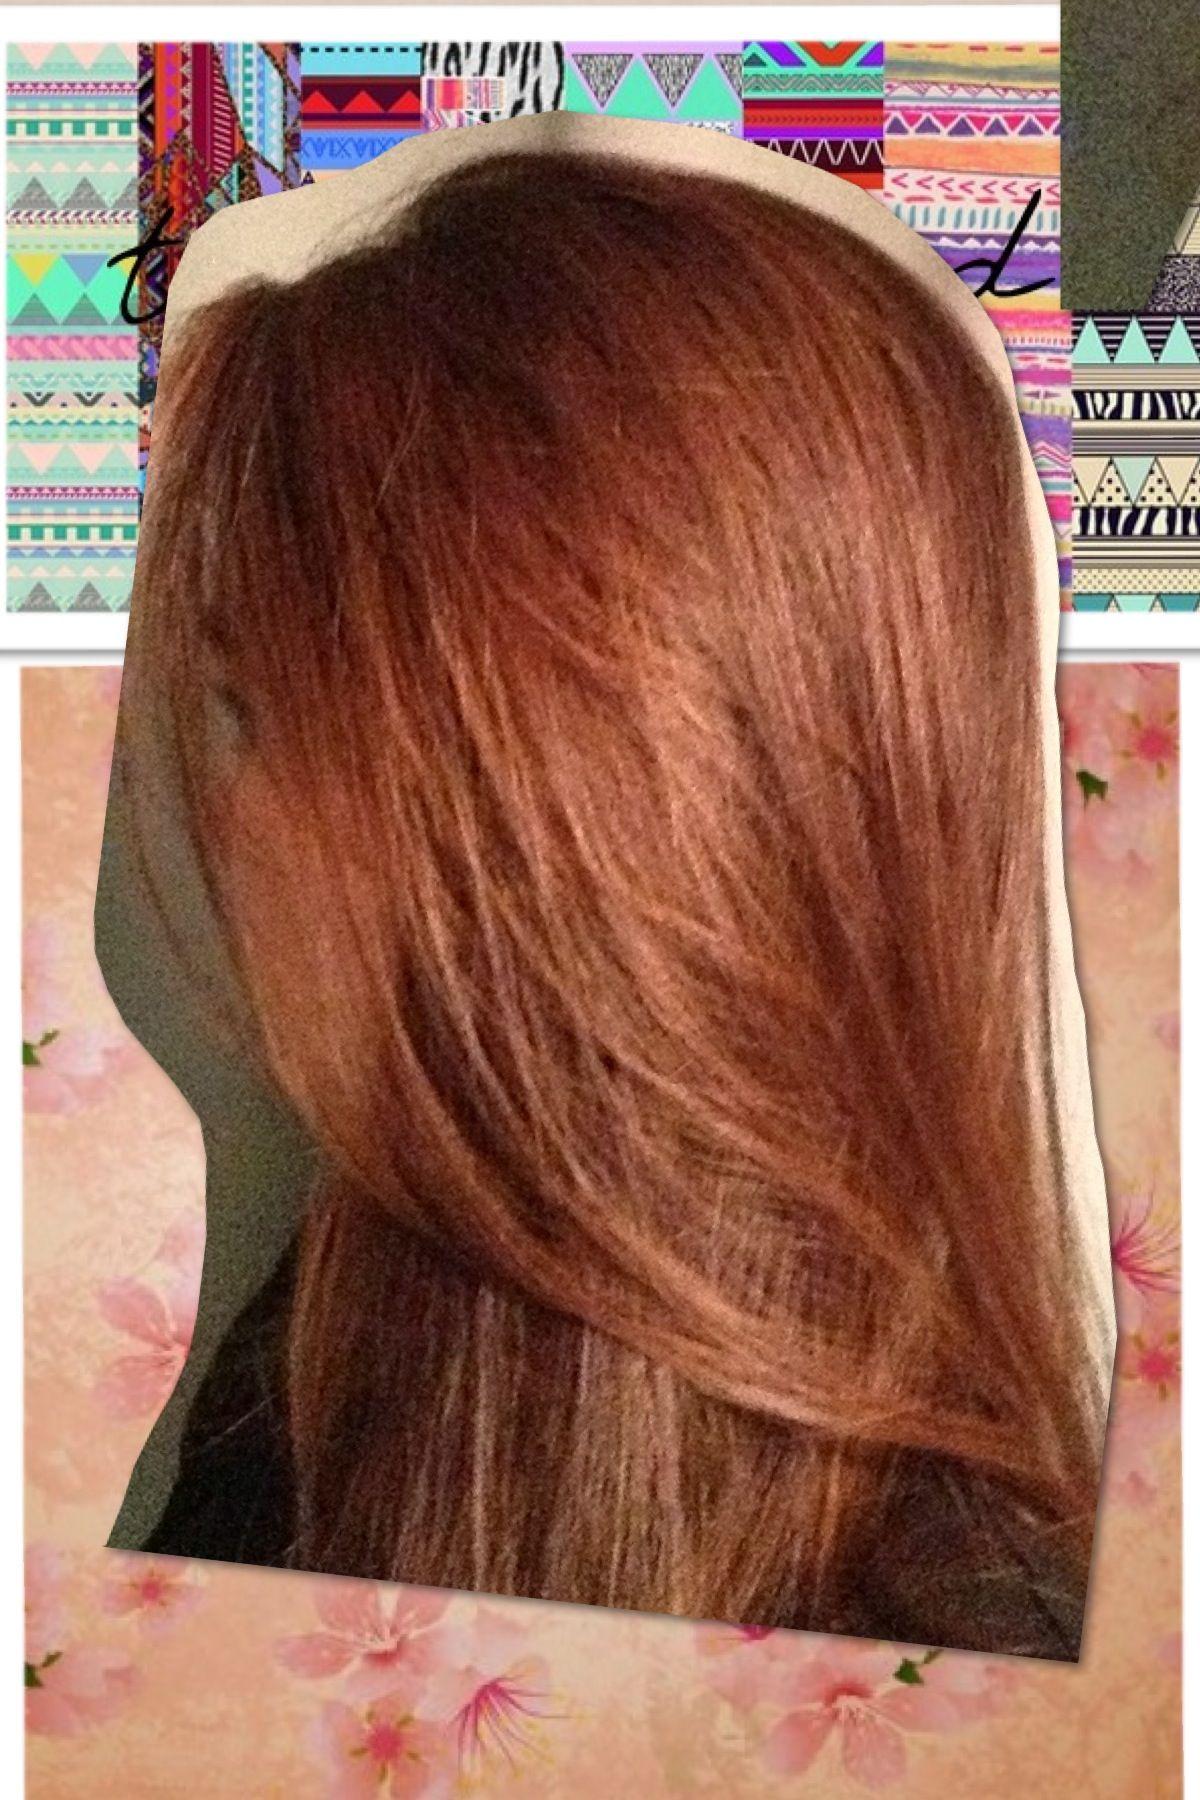 Brown hair/ let it shine :)